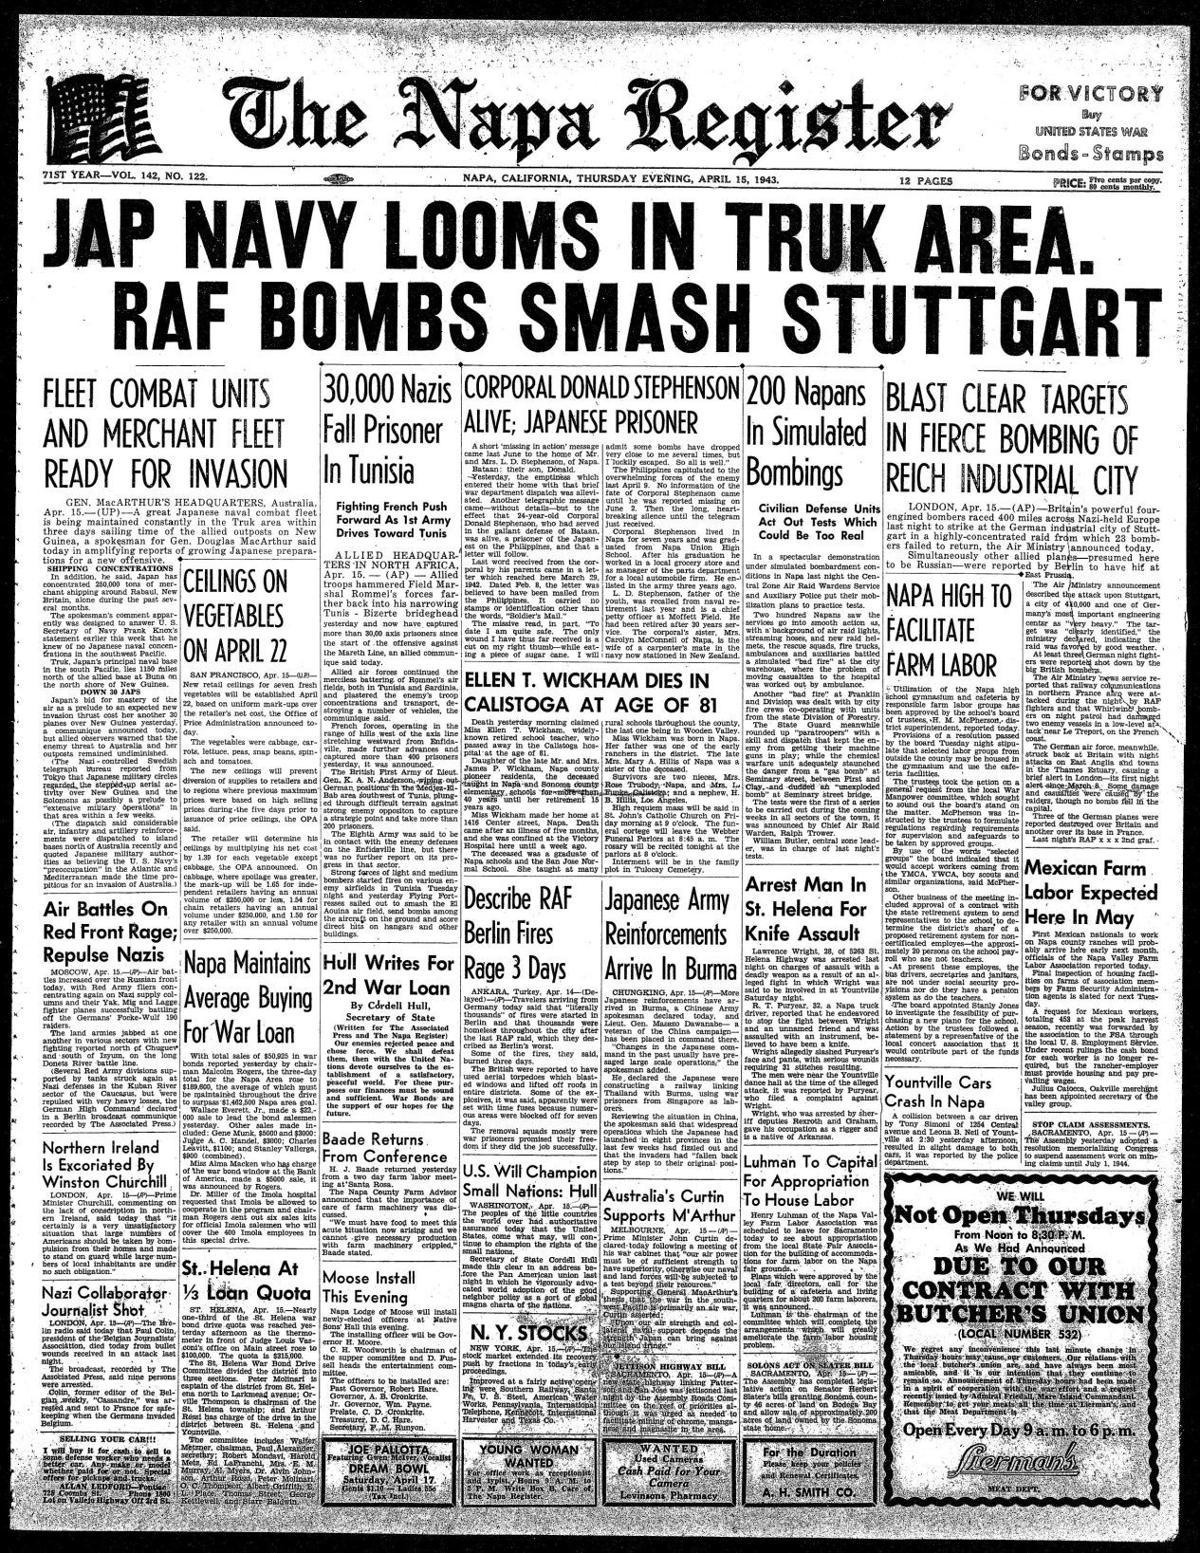 April 15, 1943